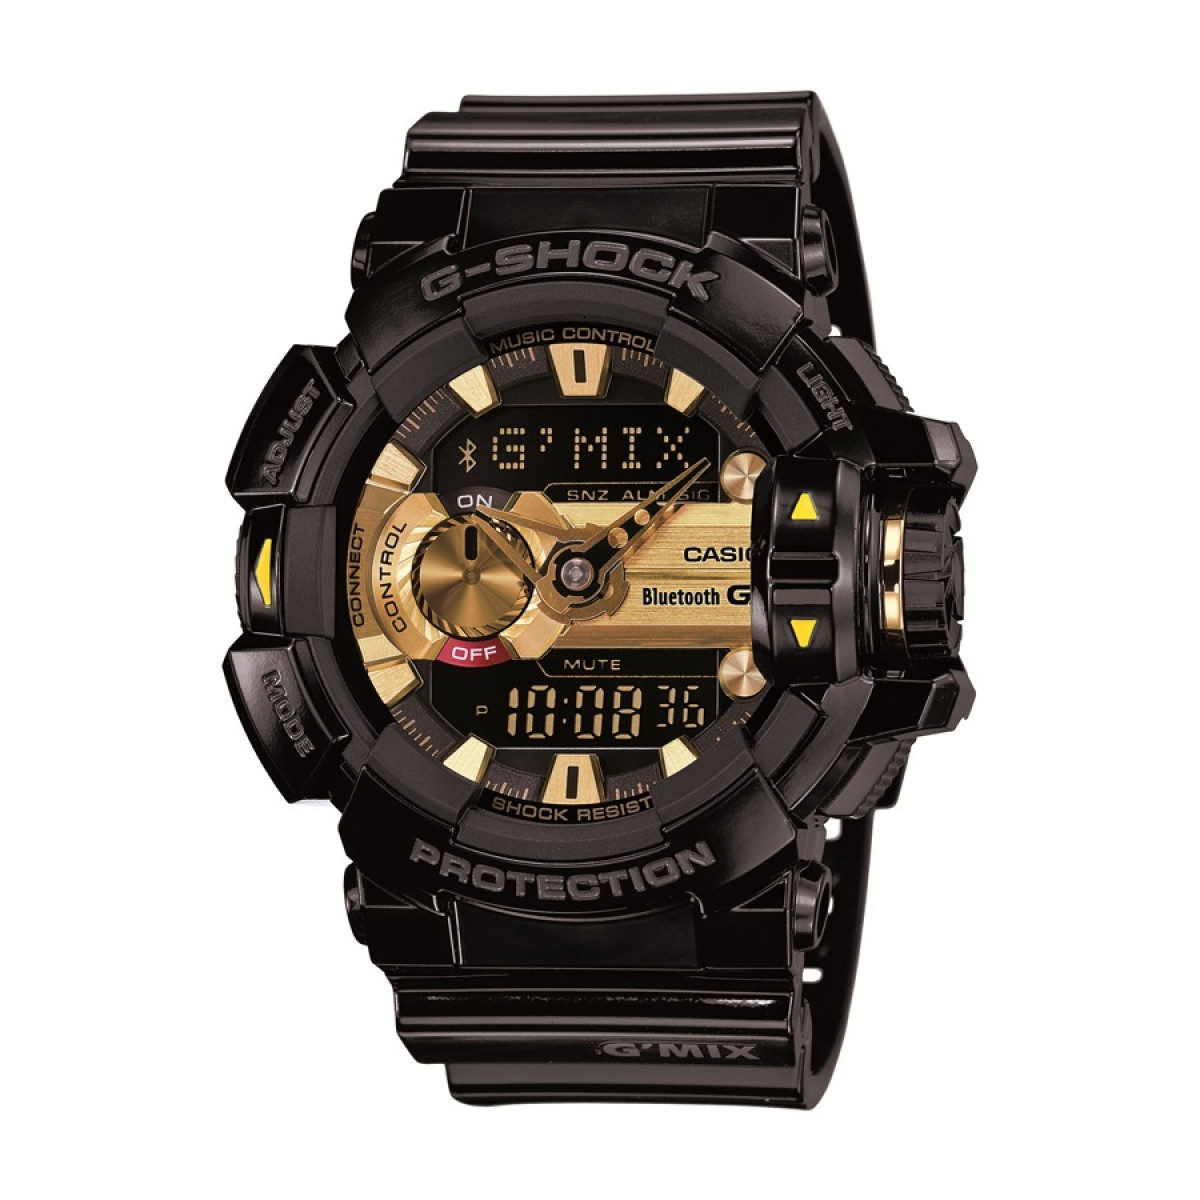 Часовник Casio G-Shock GMIX GBA-400-1A9ER